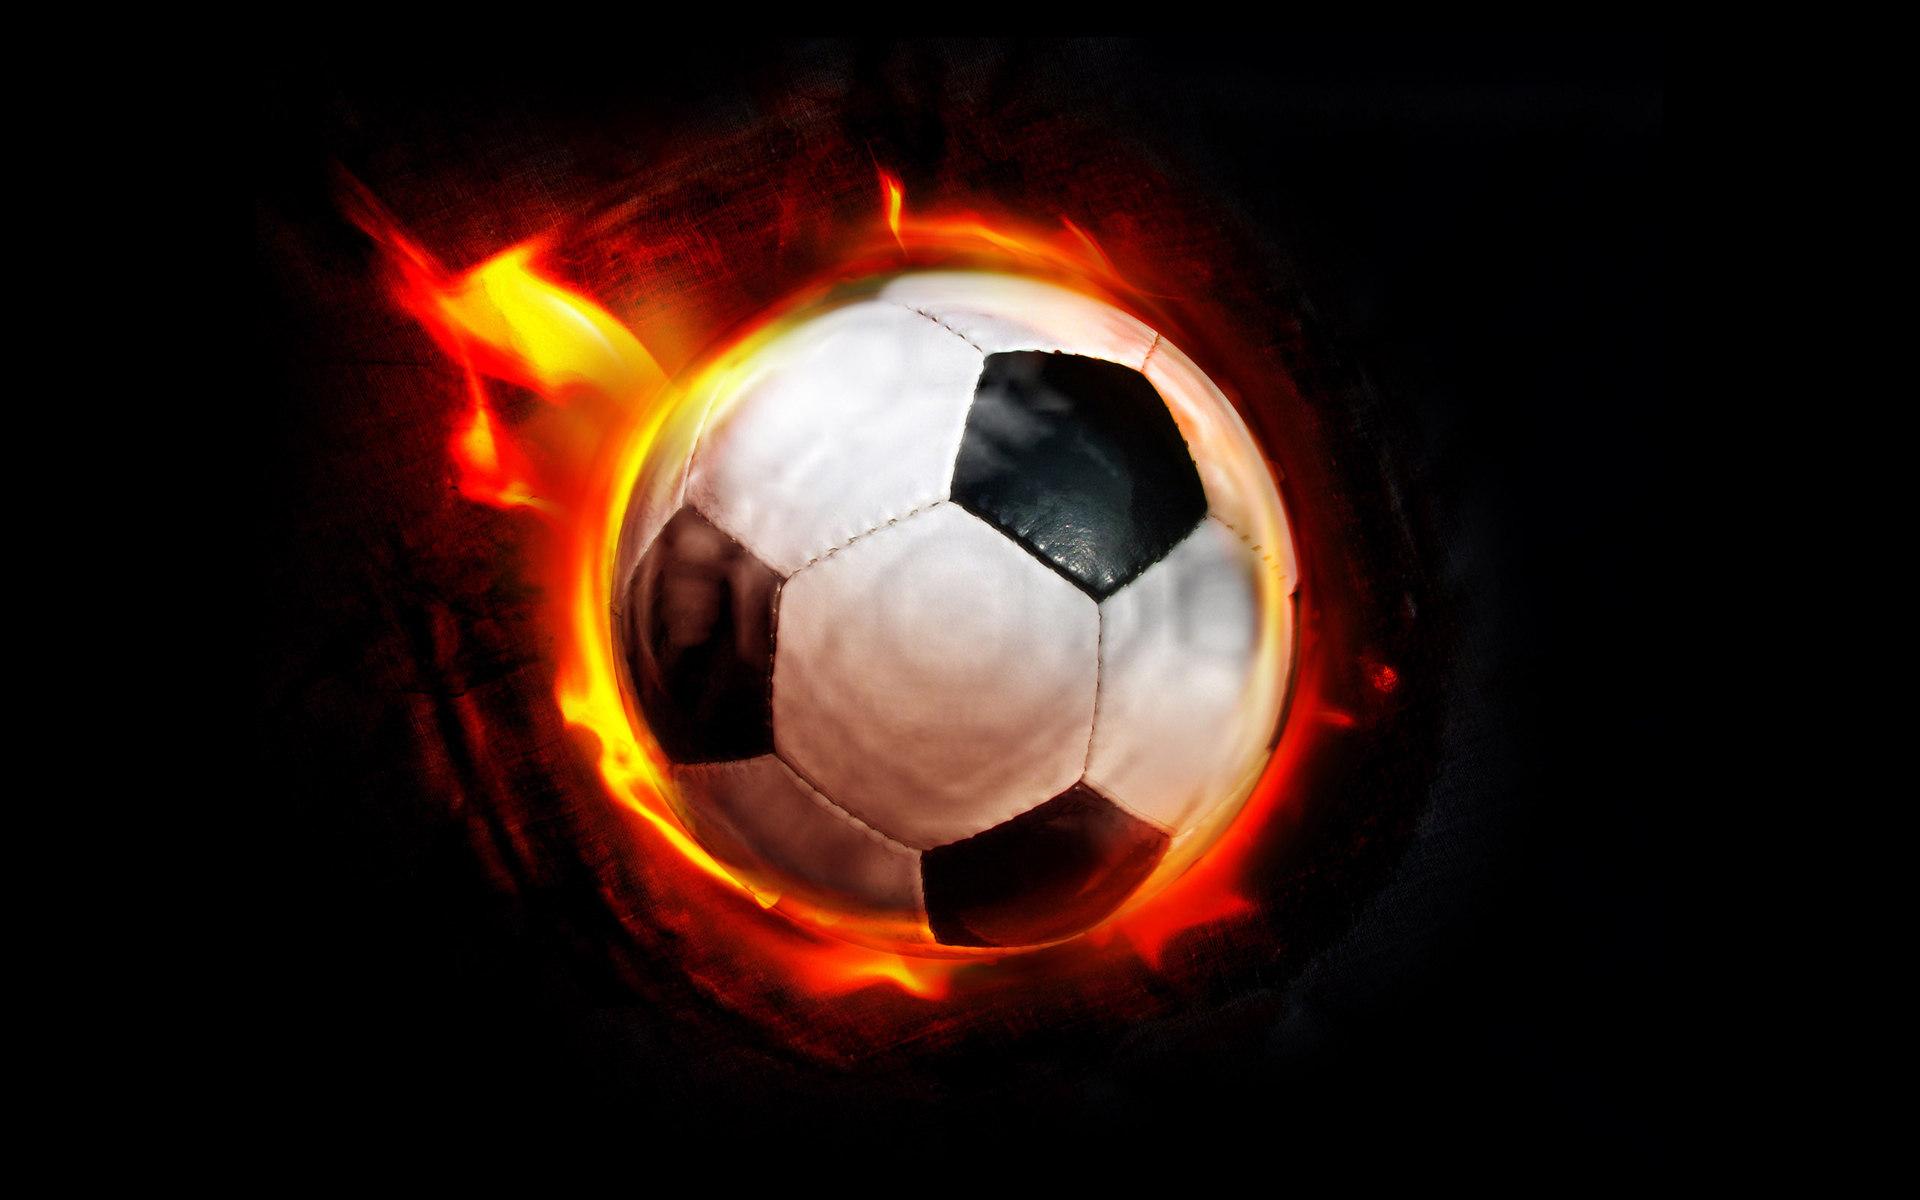 HD Soccer 12 wallpaper 1920x1200